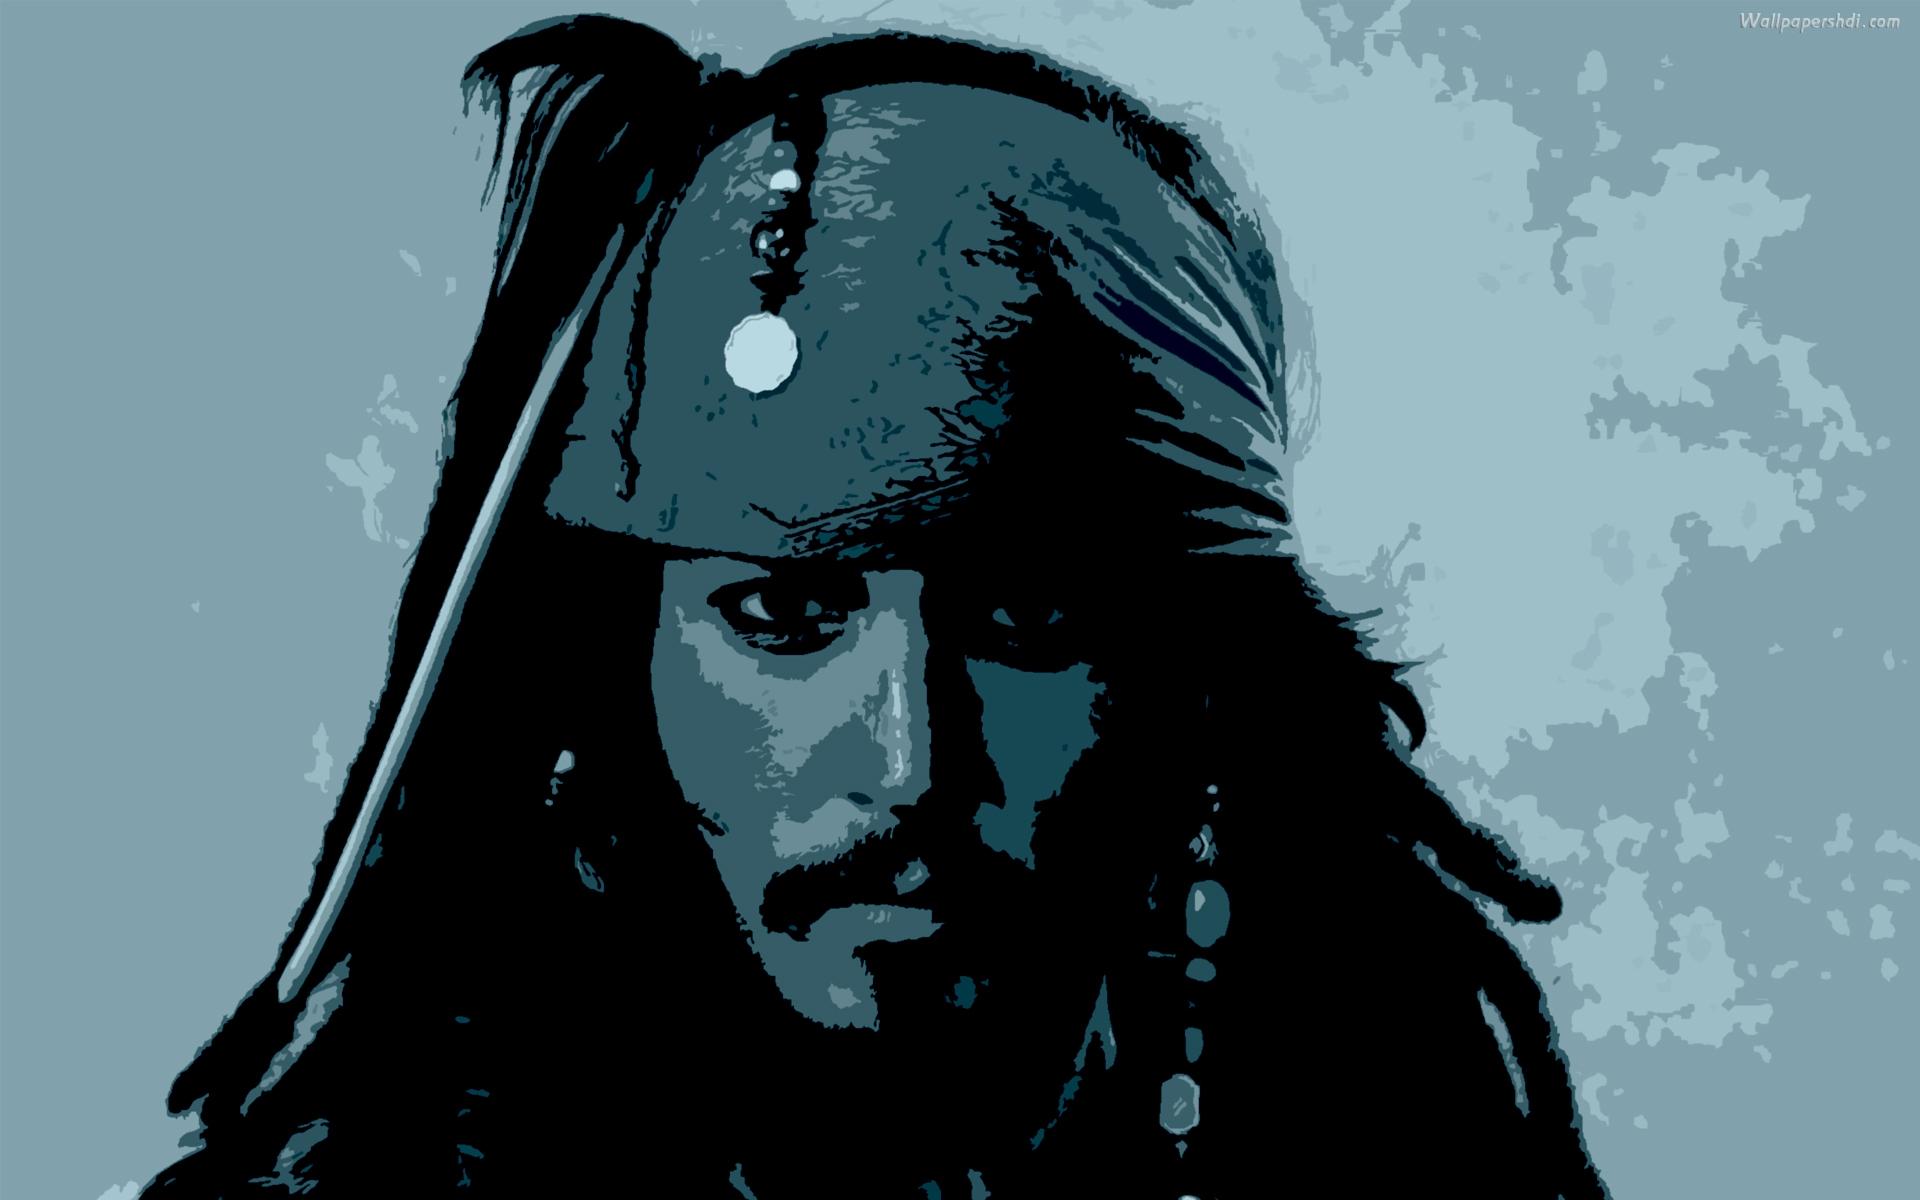 Johnny Depp Wallpaper Cartoon Hd Desktop Wallpapers 4k Hd